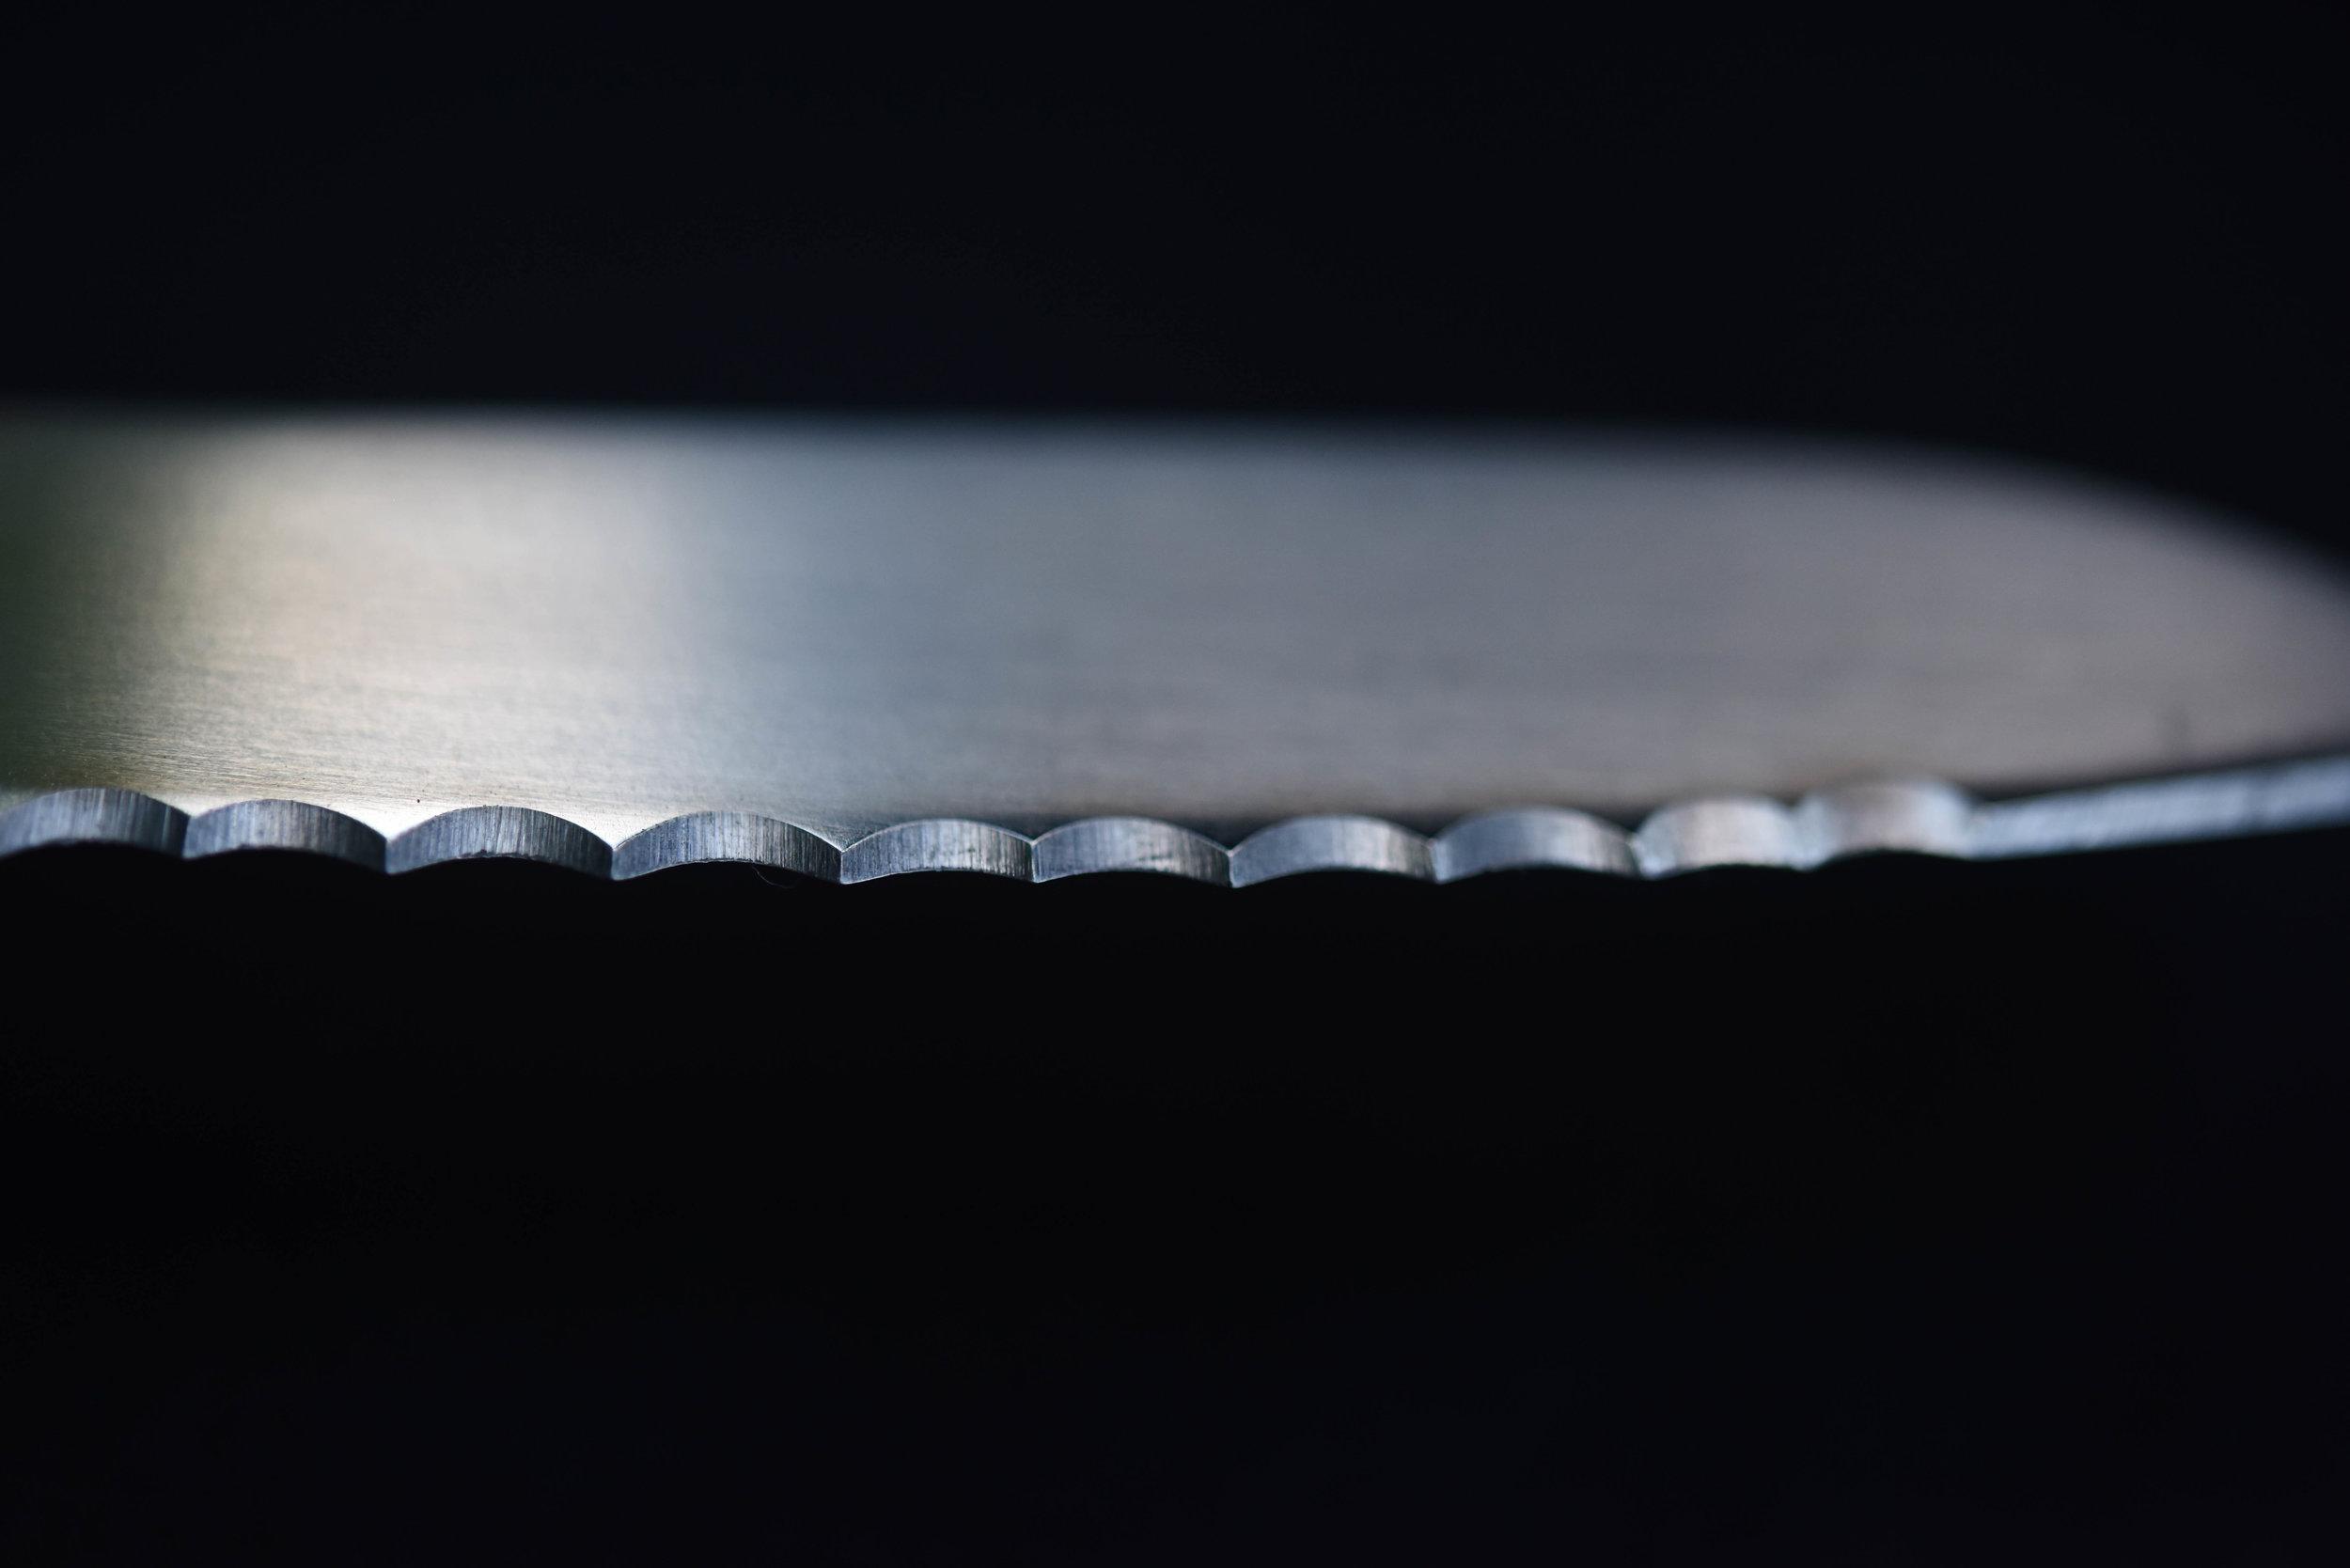 A close up of newly cut serrations